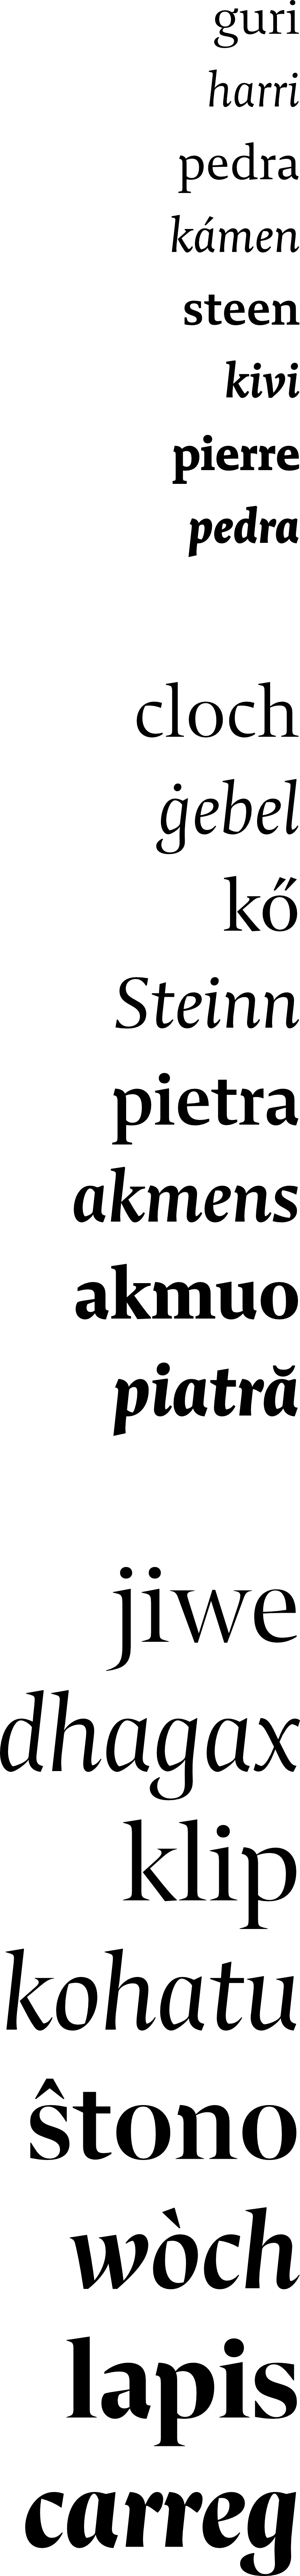 Image-languages